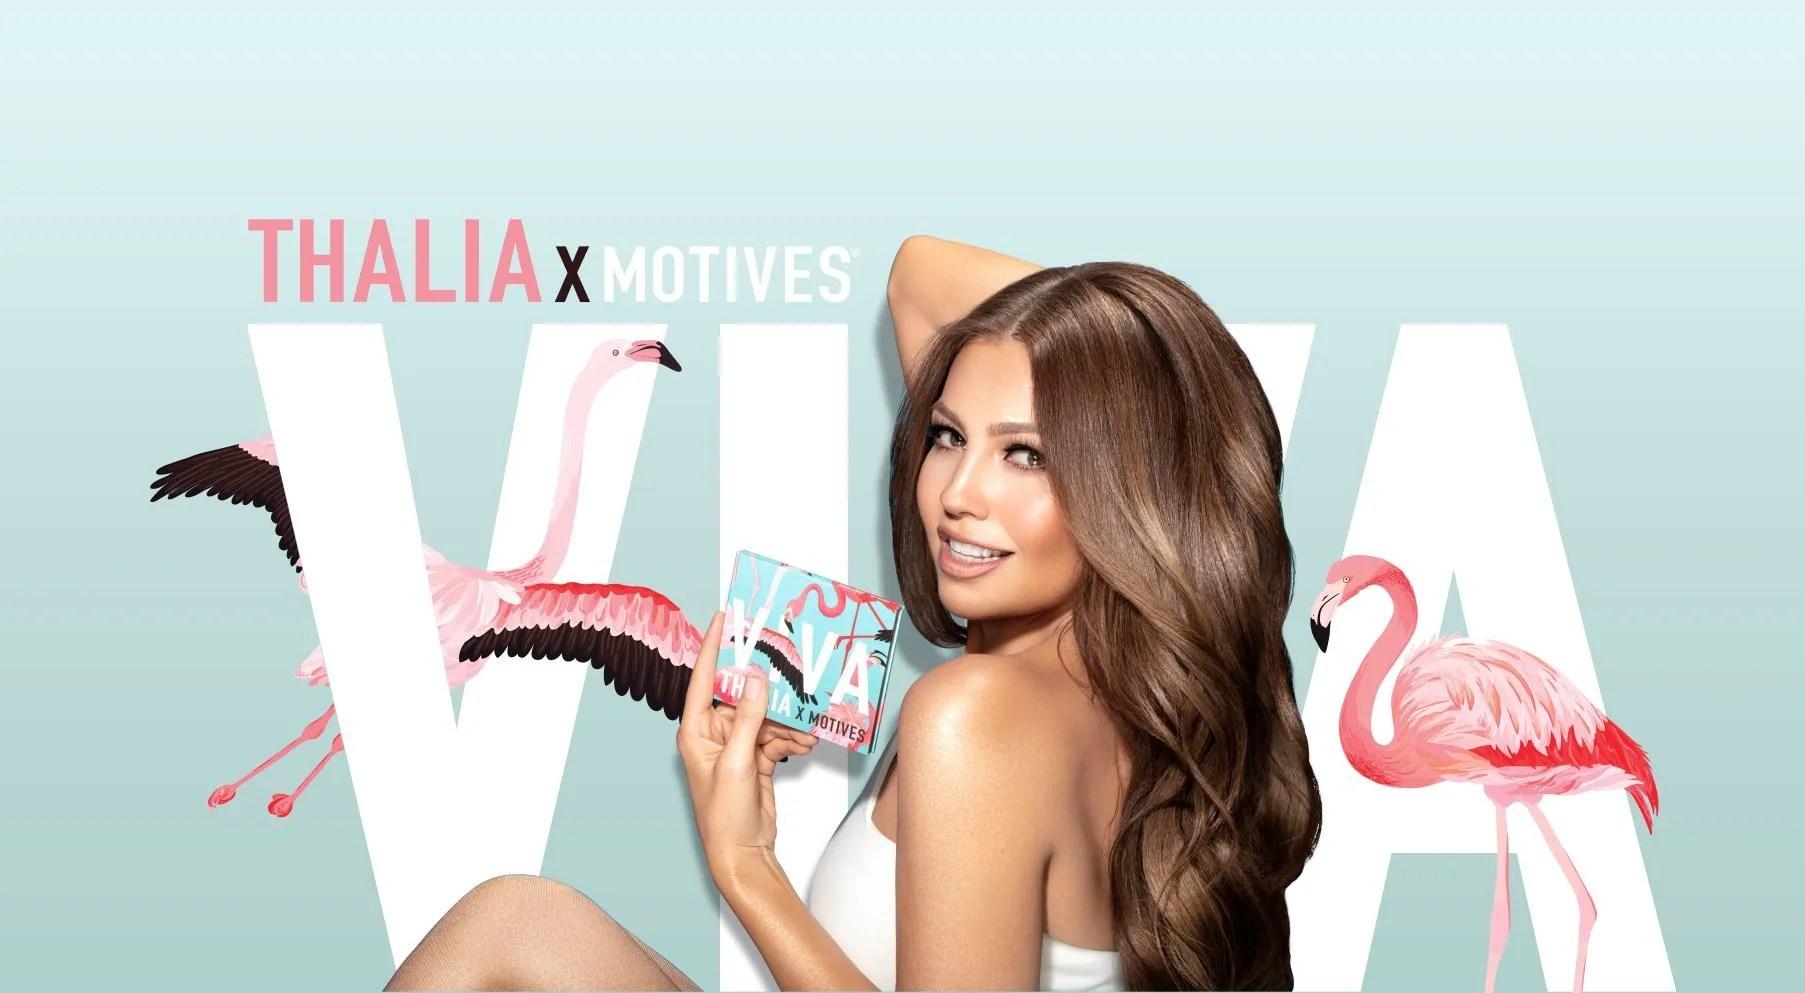 THALIA x Motives VIVA Eye & Cheek Palette-A Summer Must Have